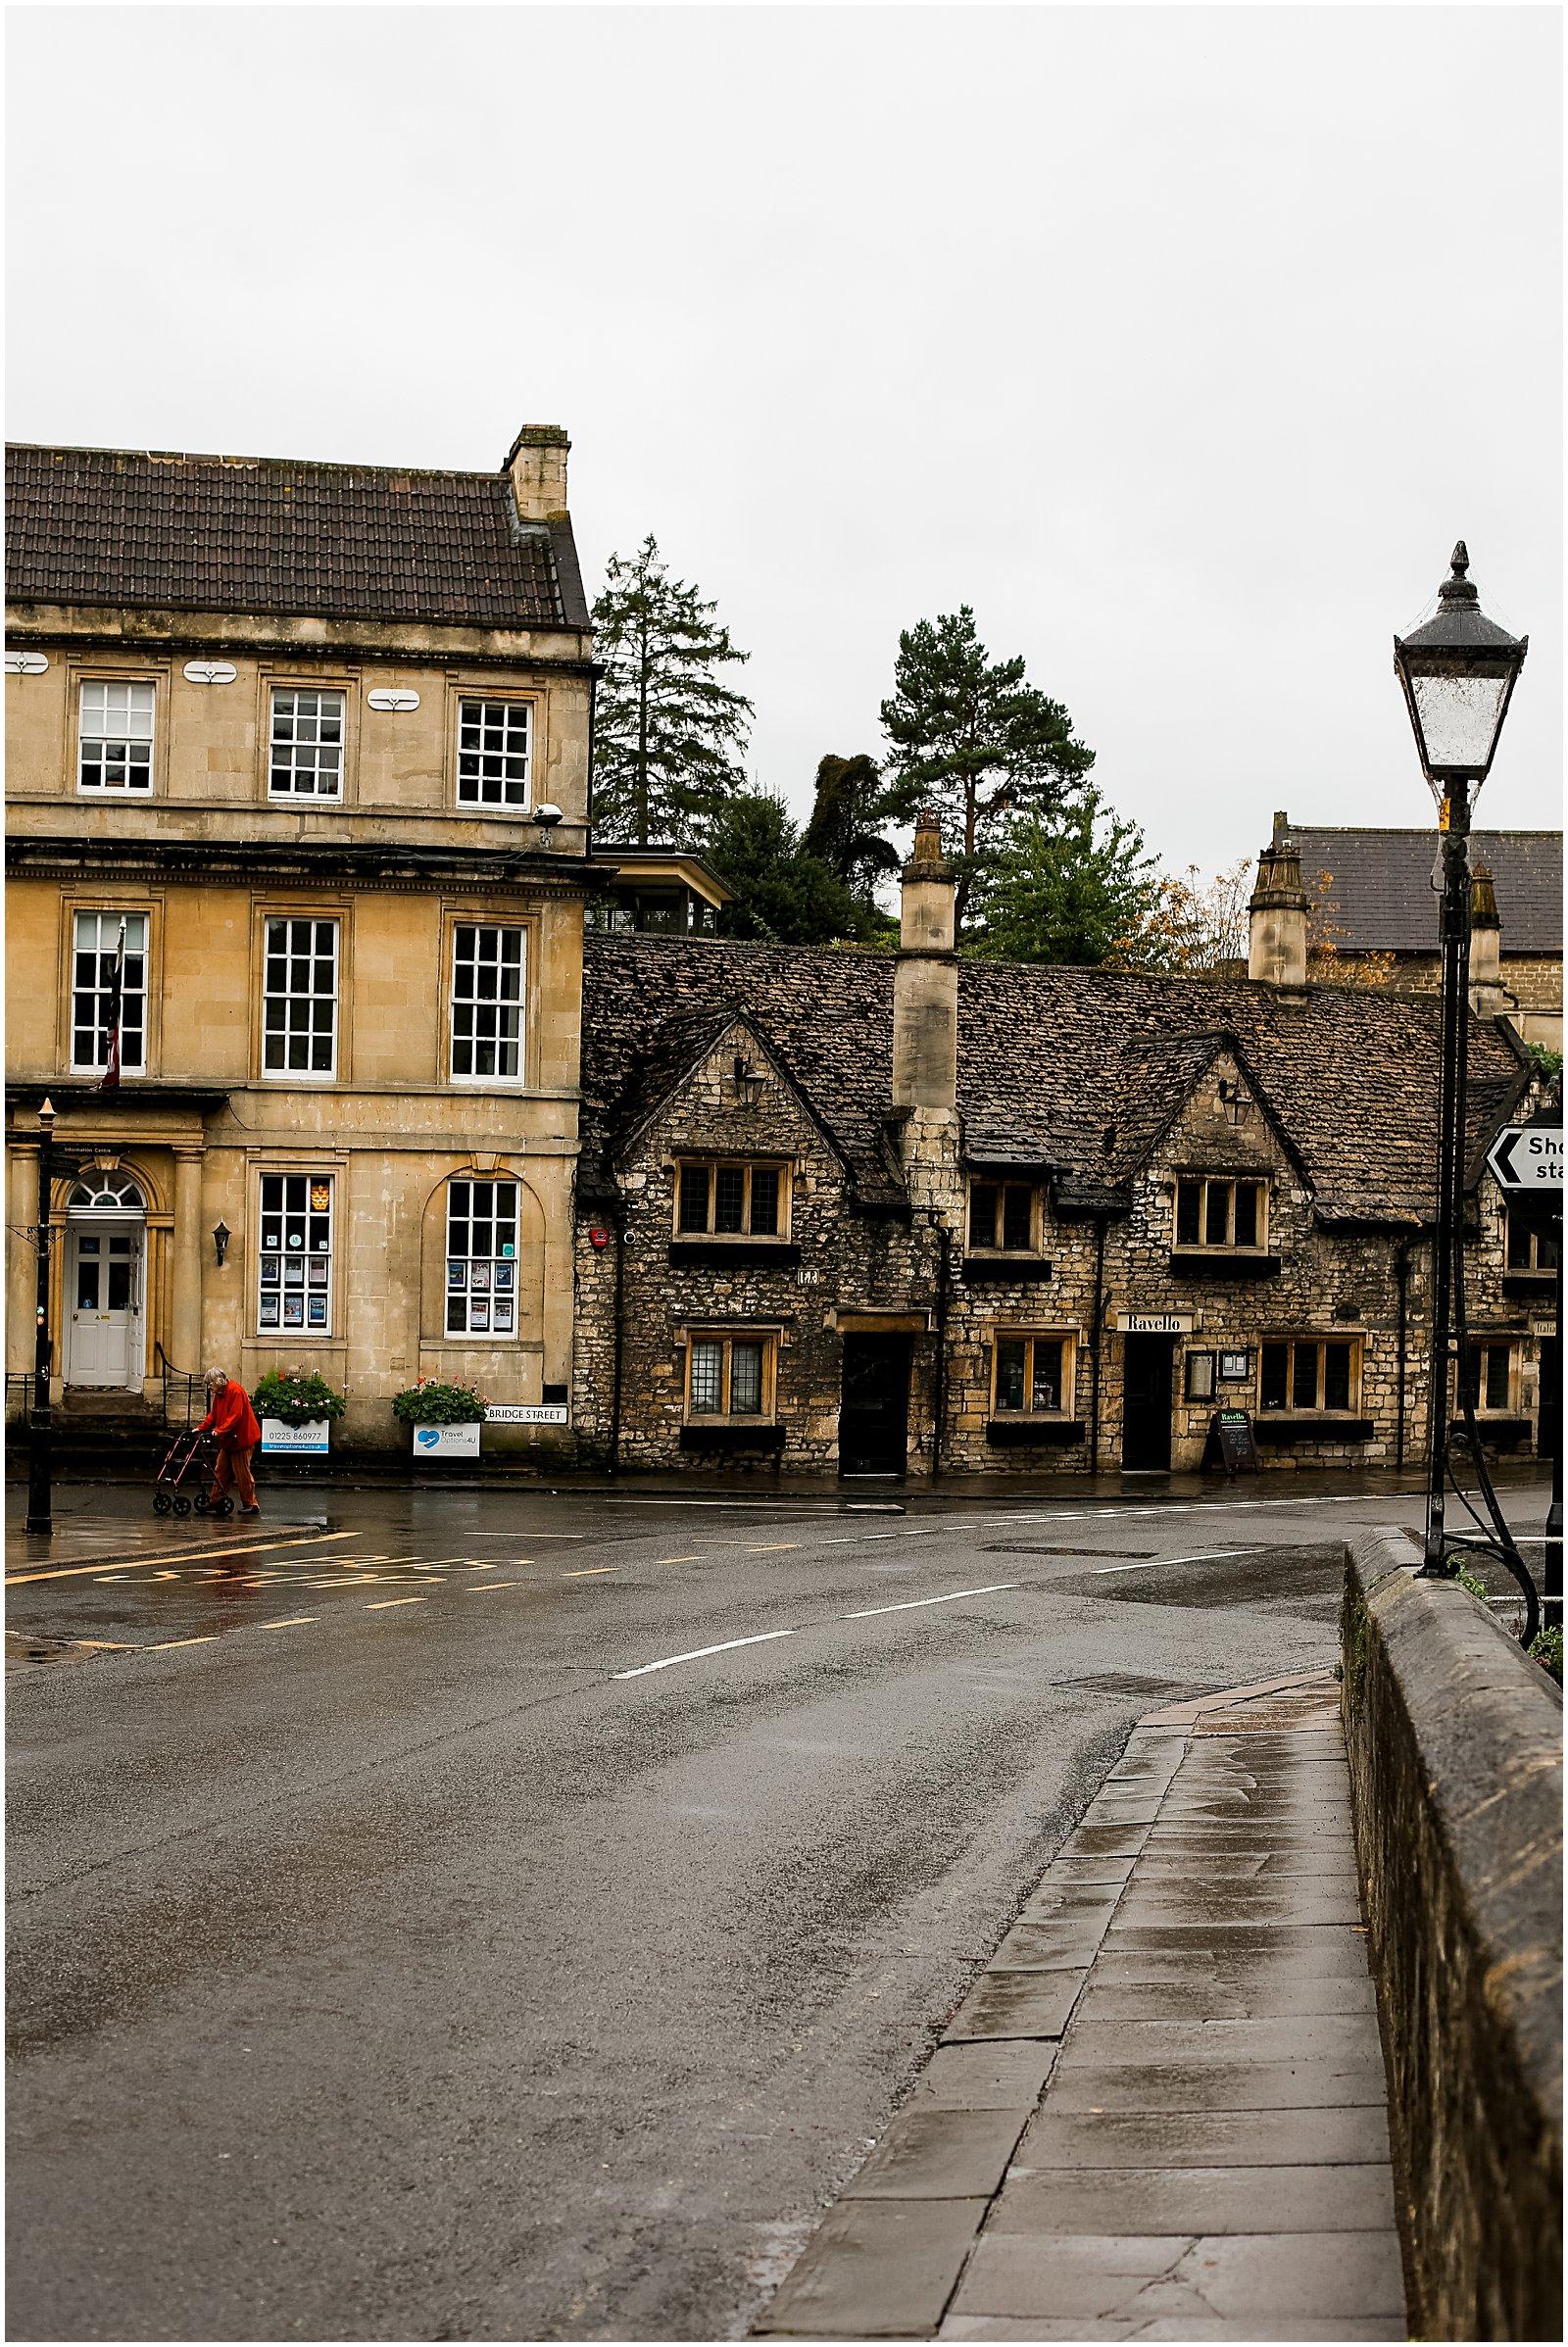 Bradford-on-Avon England photographed by Helena Woods